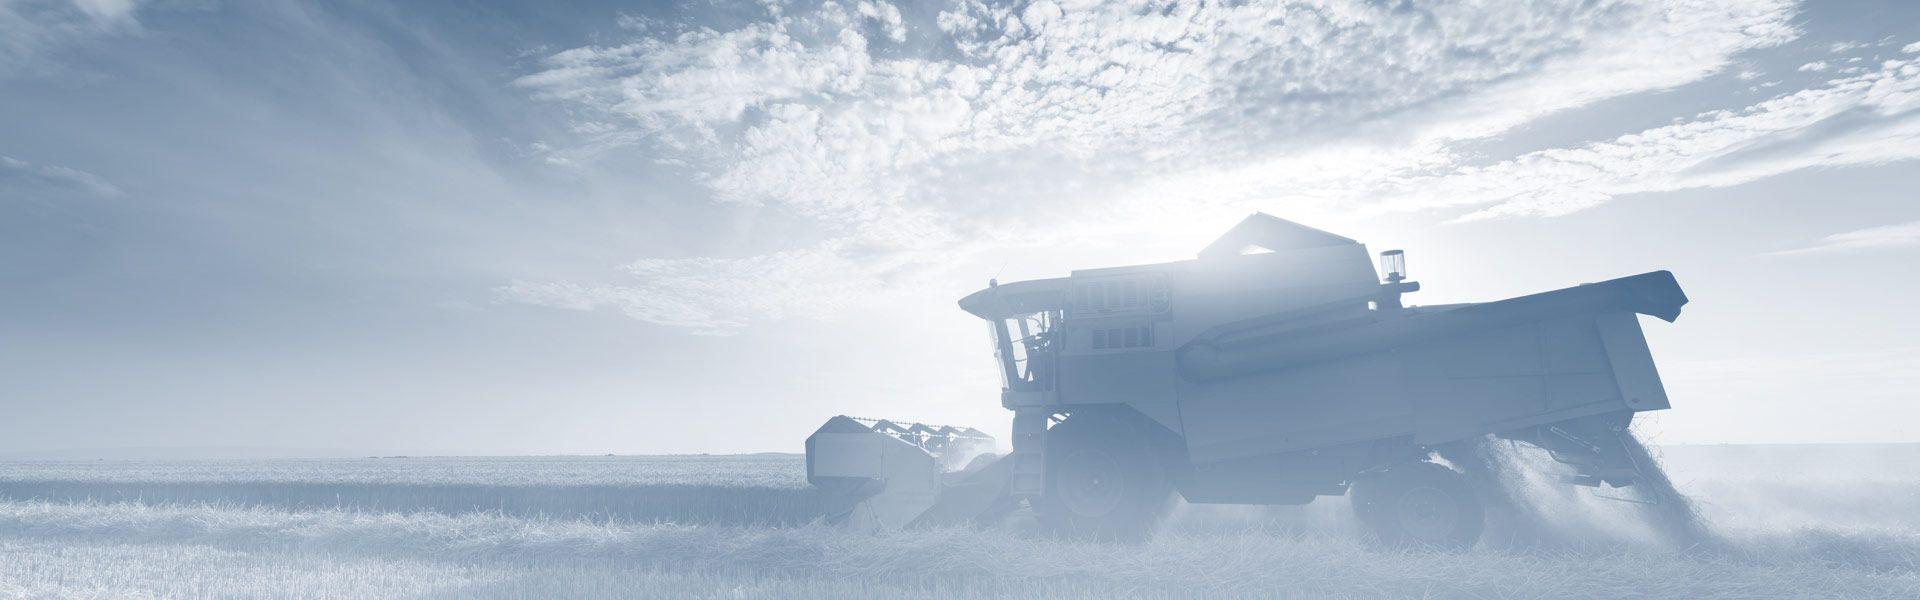 LEWIS & CLARK AGRIFOOD - Lewis & Clark Partners